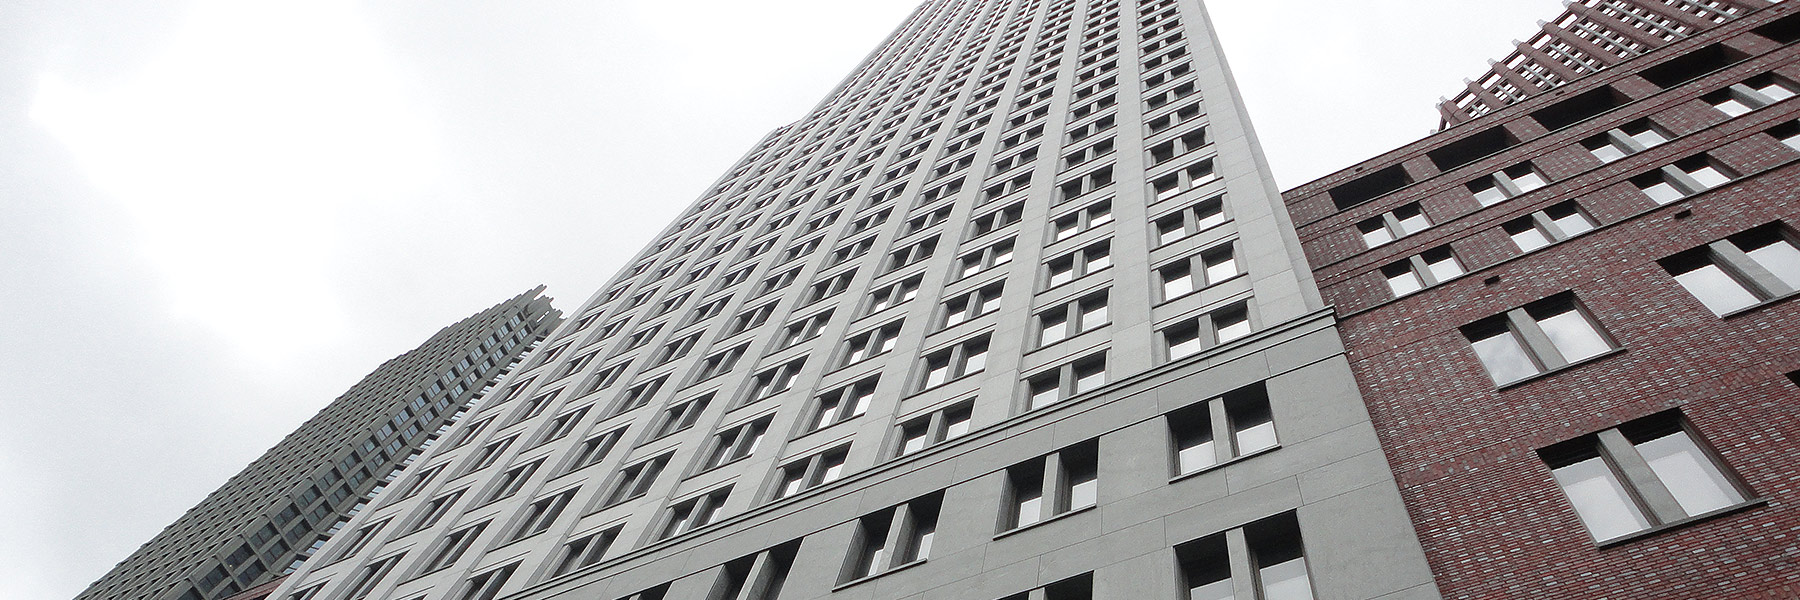 gevelbekleding gebouw